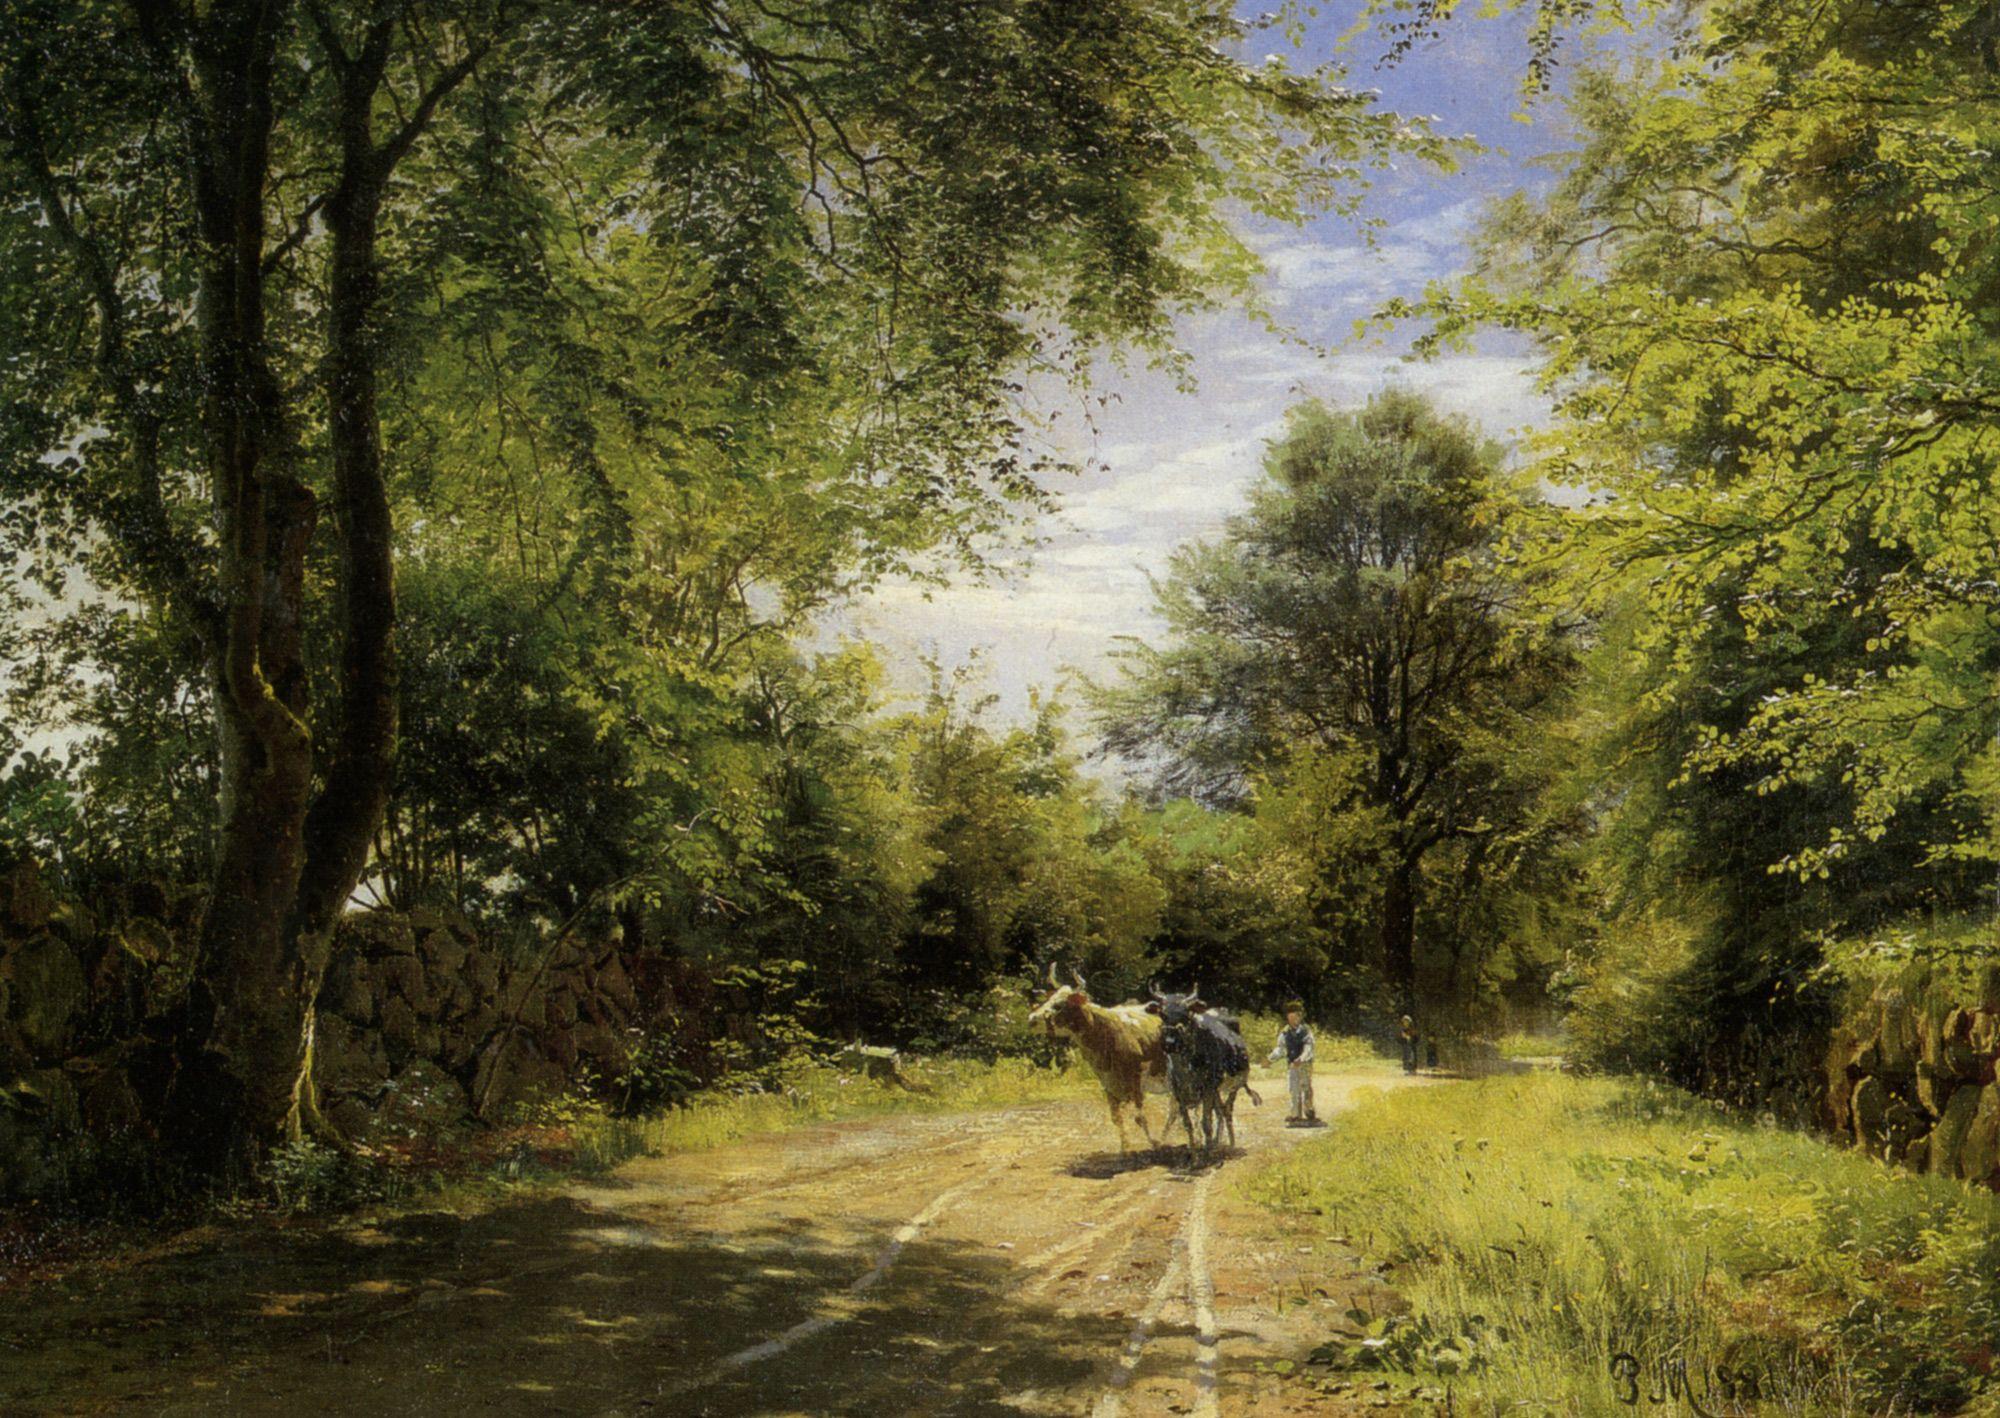 "Peder Mork Monsted (Peder Mork Mønsted) (1859-1941) The Young Cowherd Oil On Canvas -1881 61 x 87 cm (24.02"" x 34¼"")"